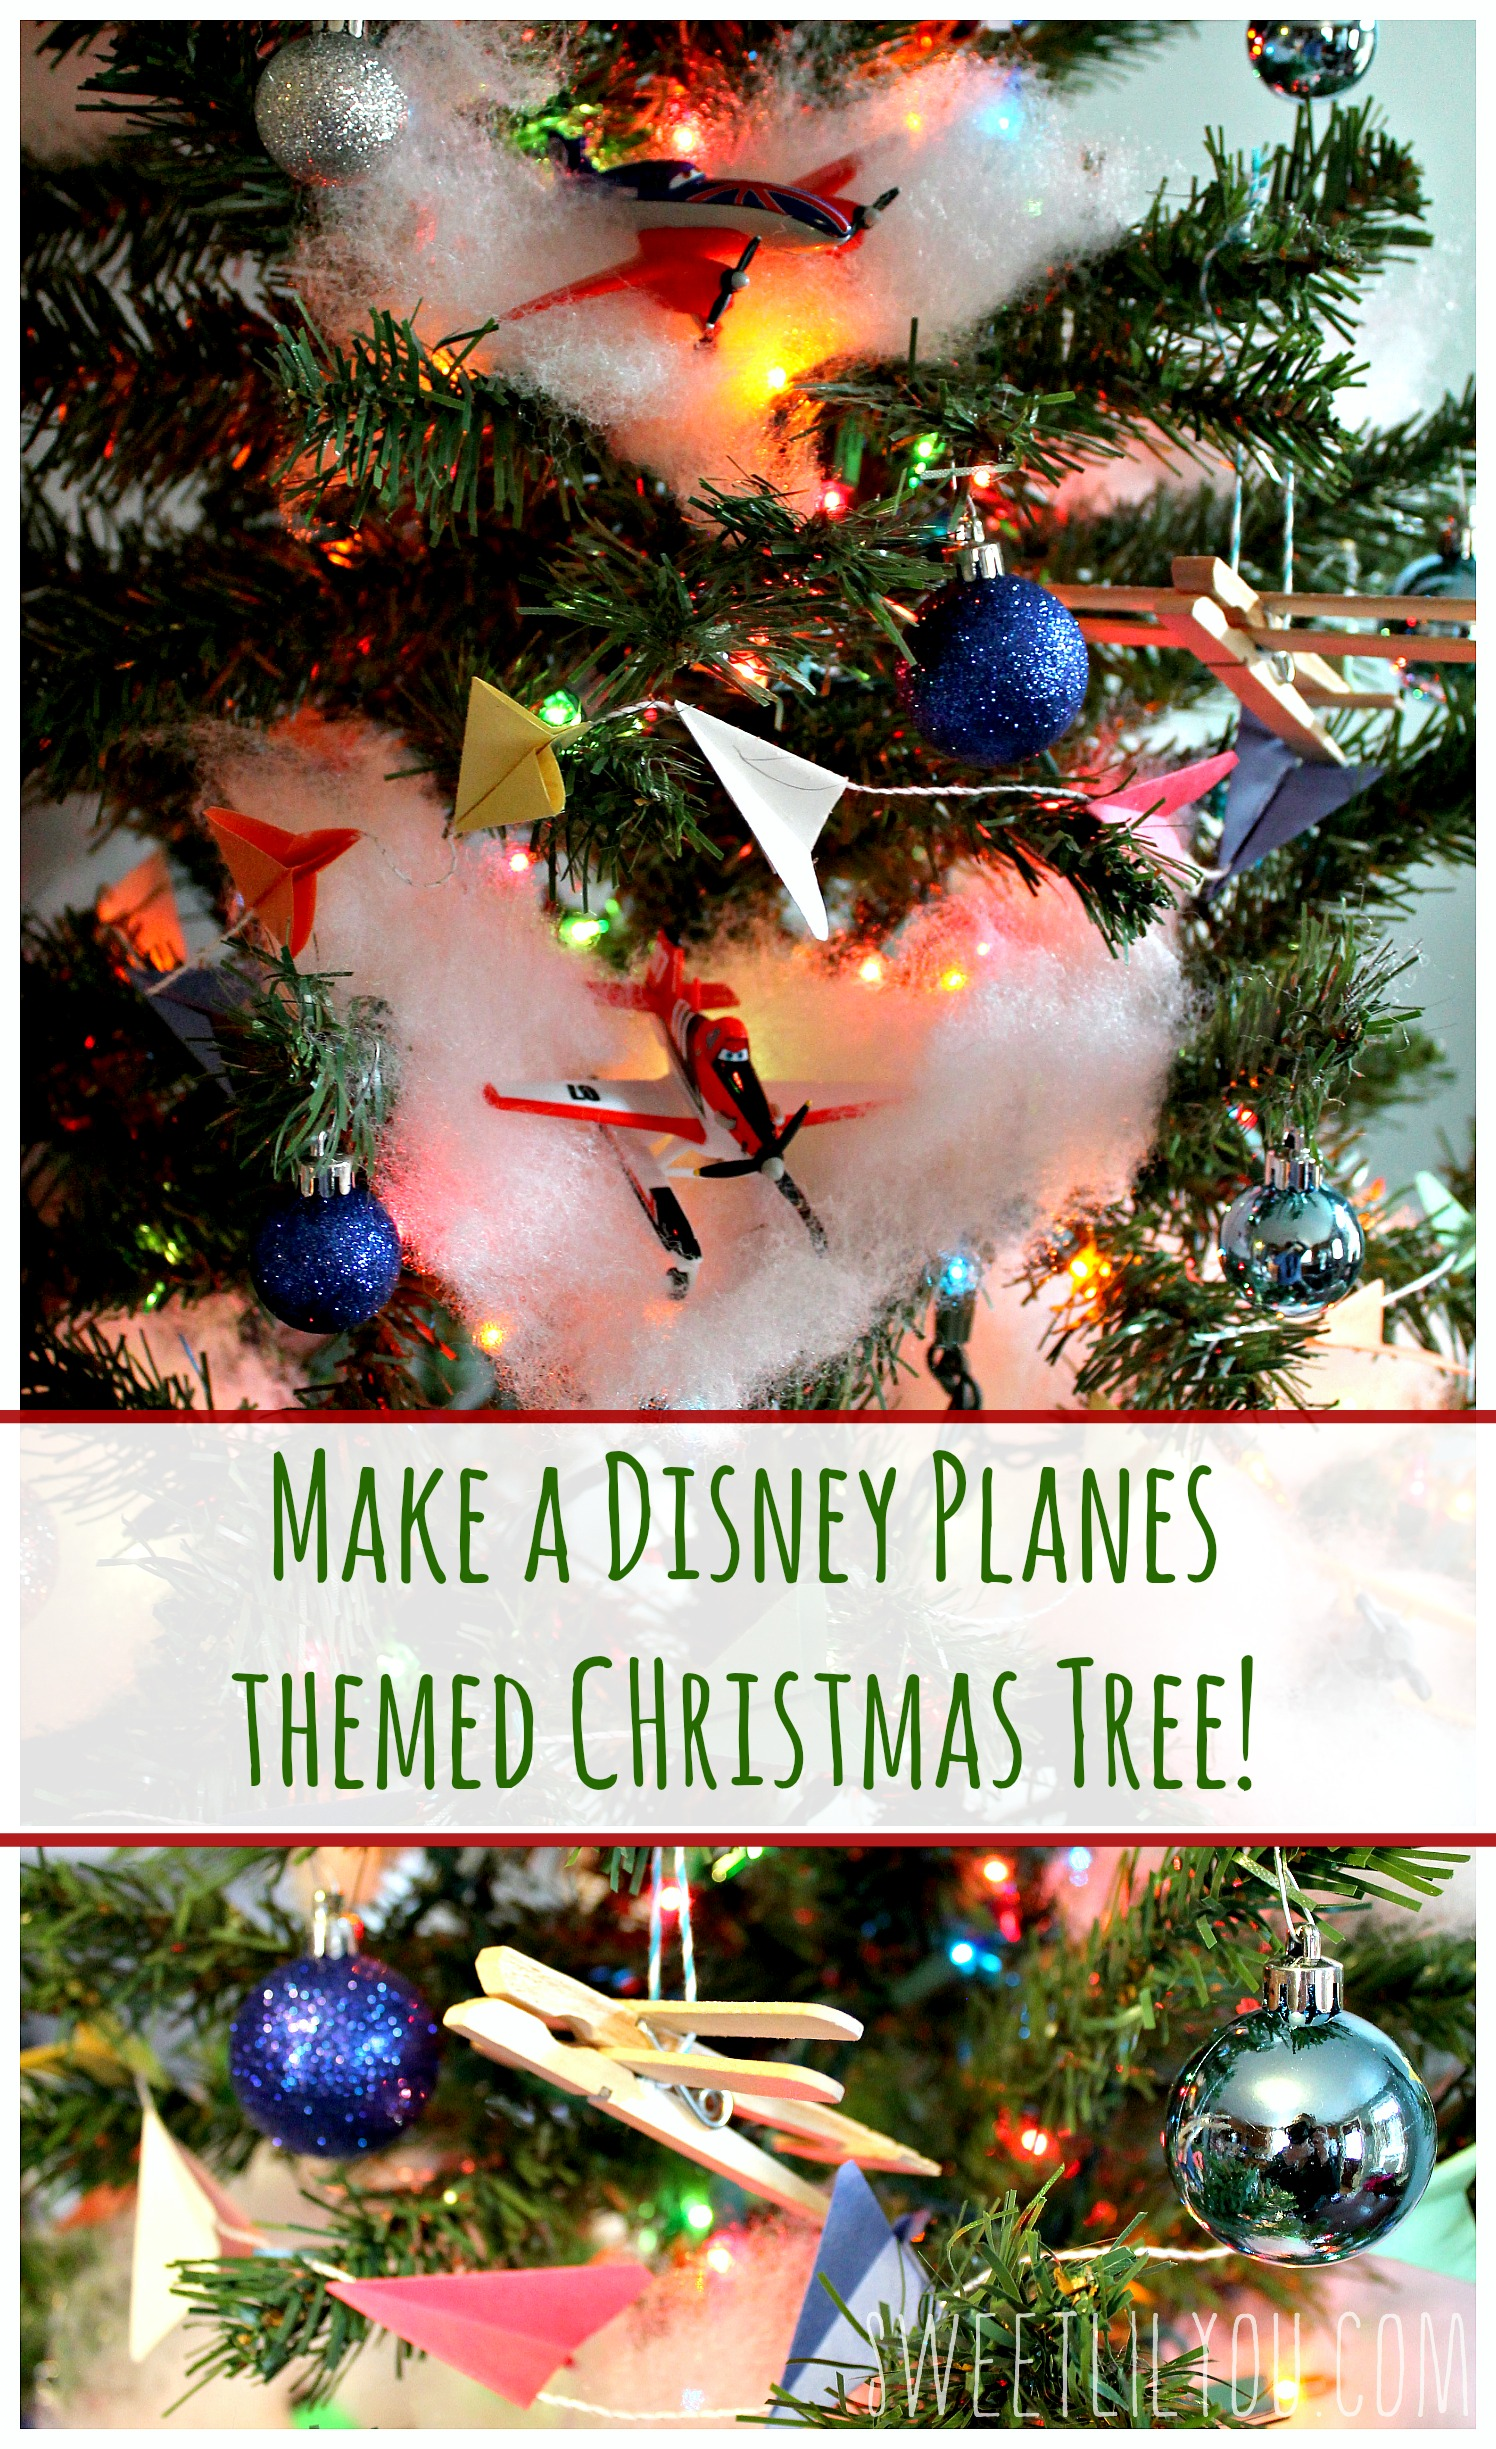 Disney Planes Themed Christmas Tree PlanesToTheRescue